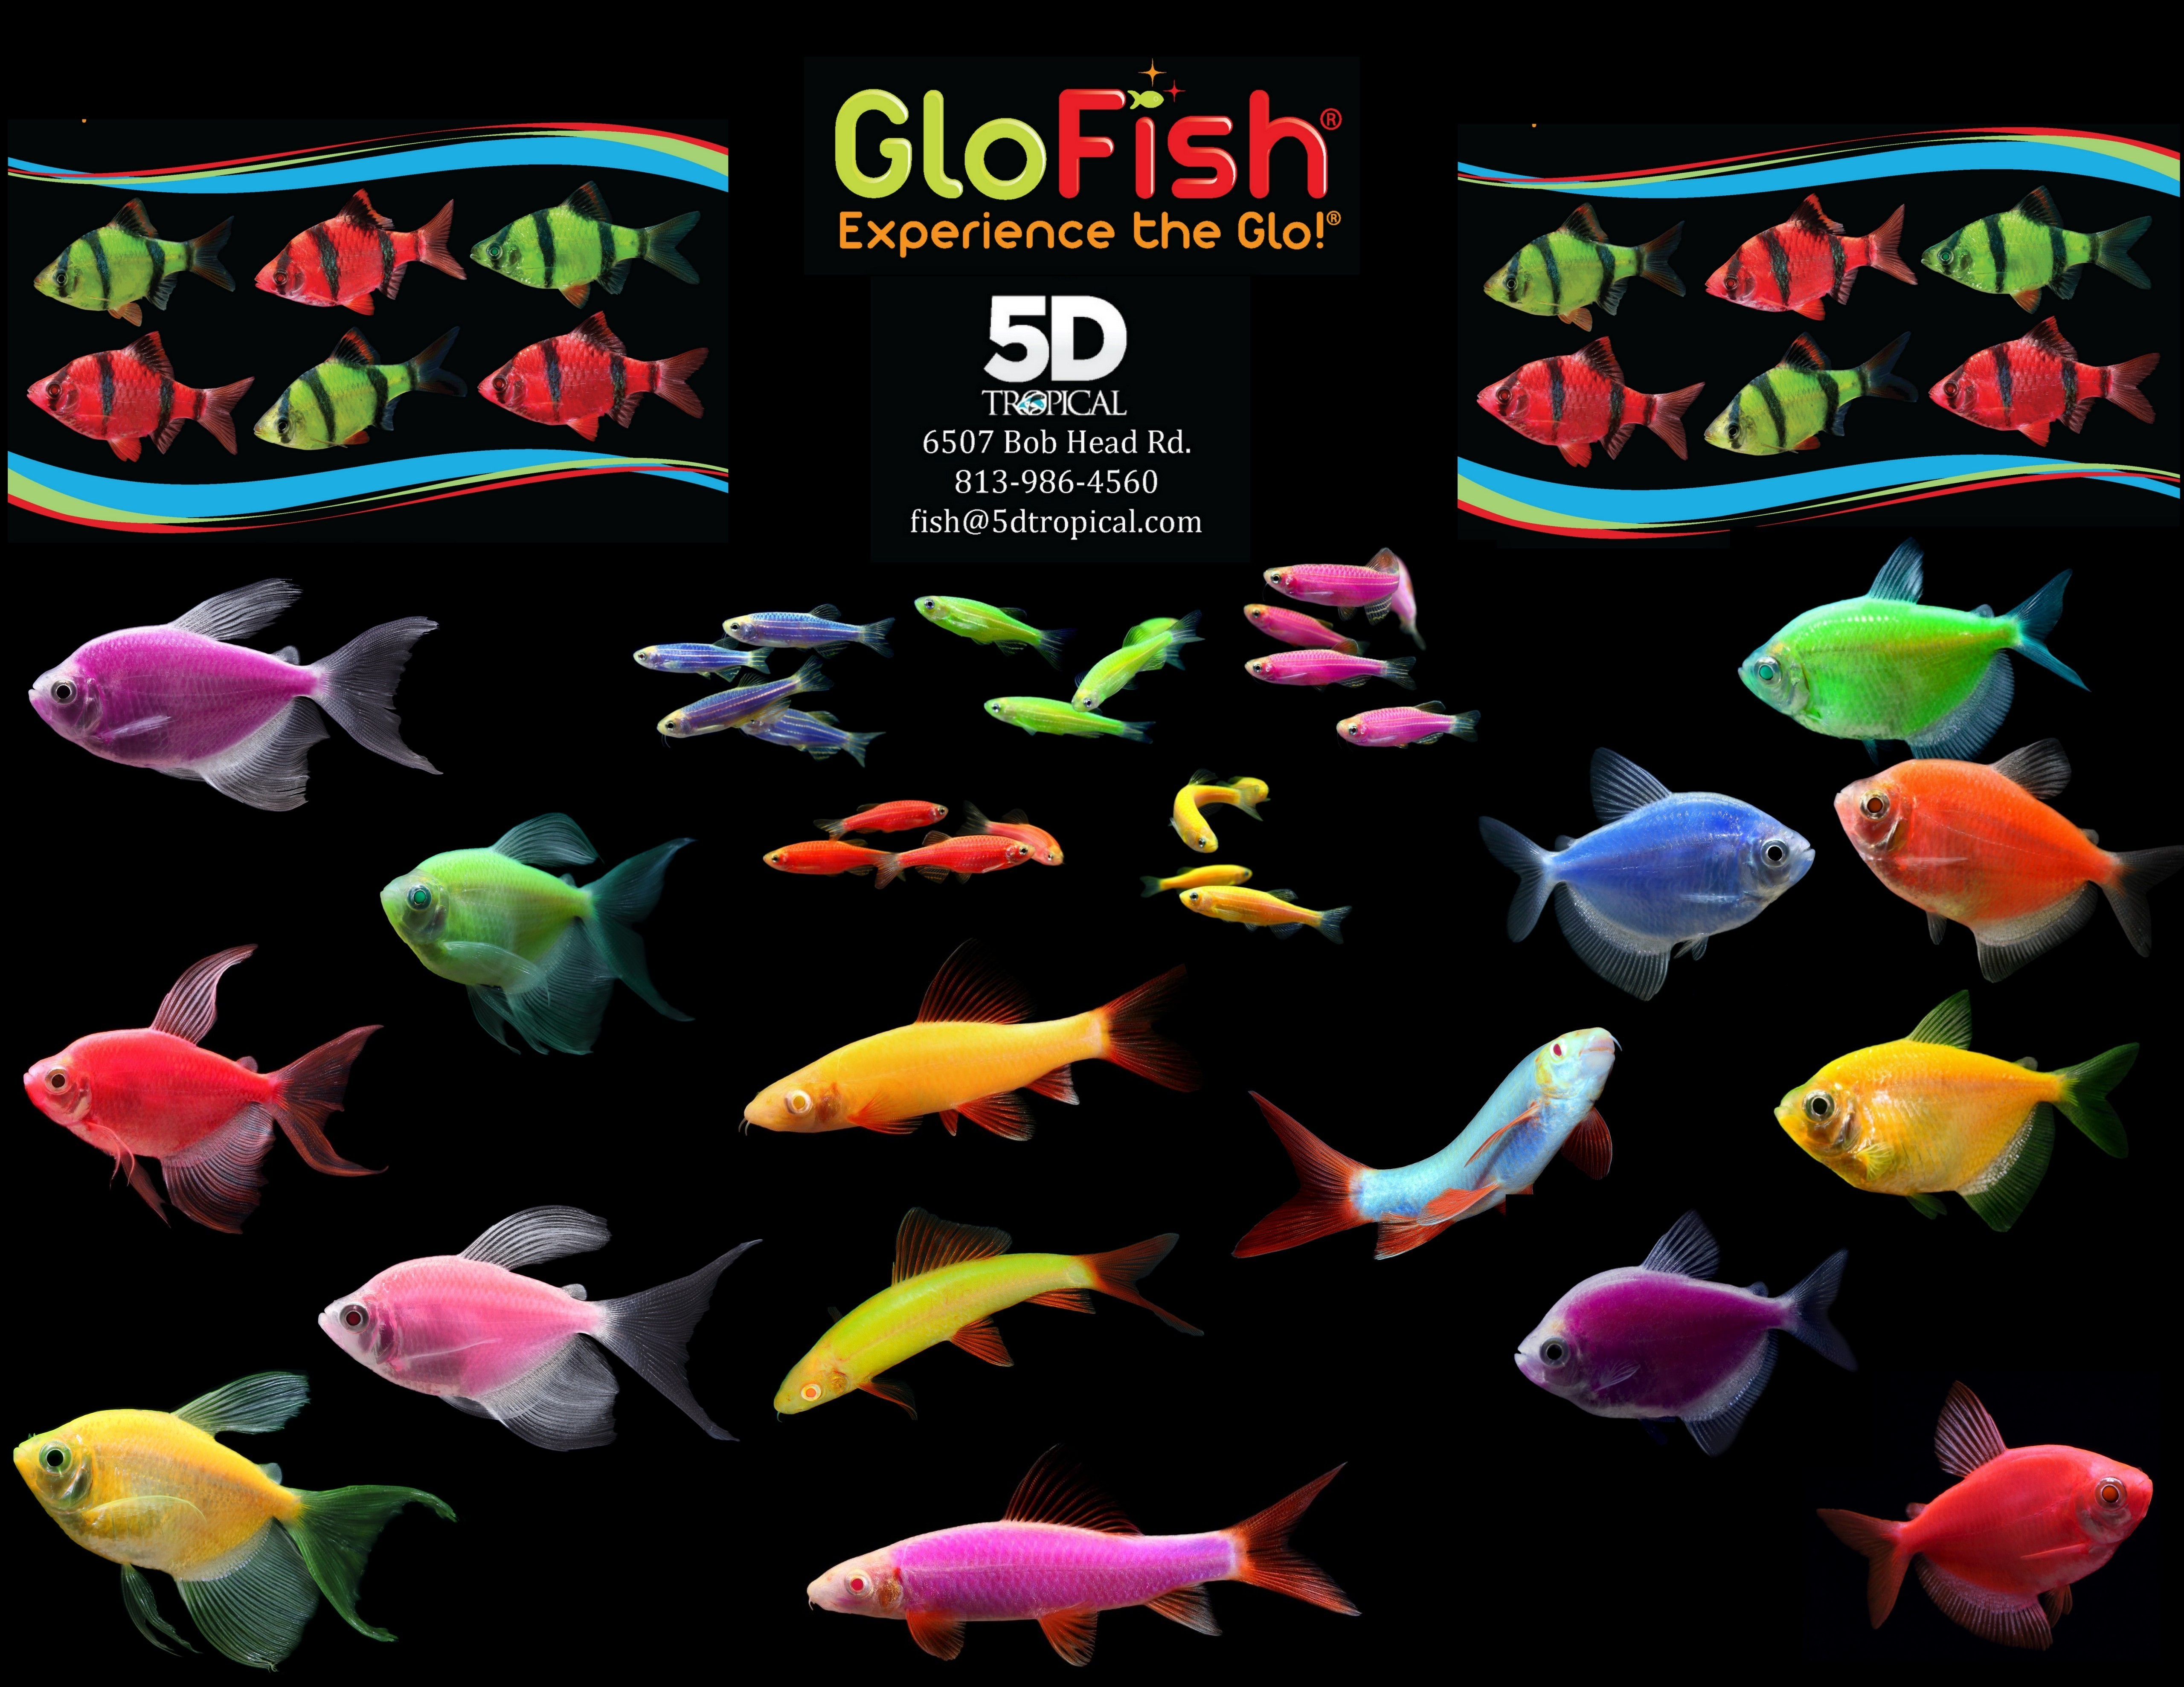 glofish-collage-with-lf-tetra-and-sharks.jpg